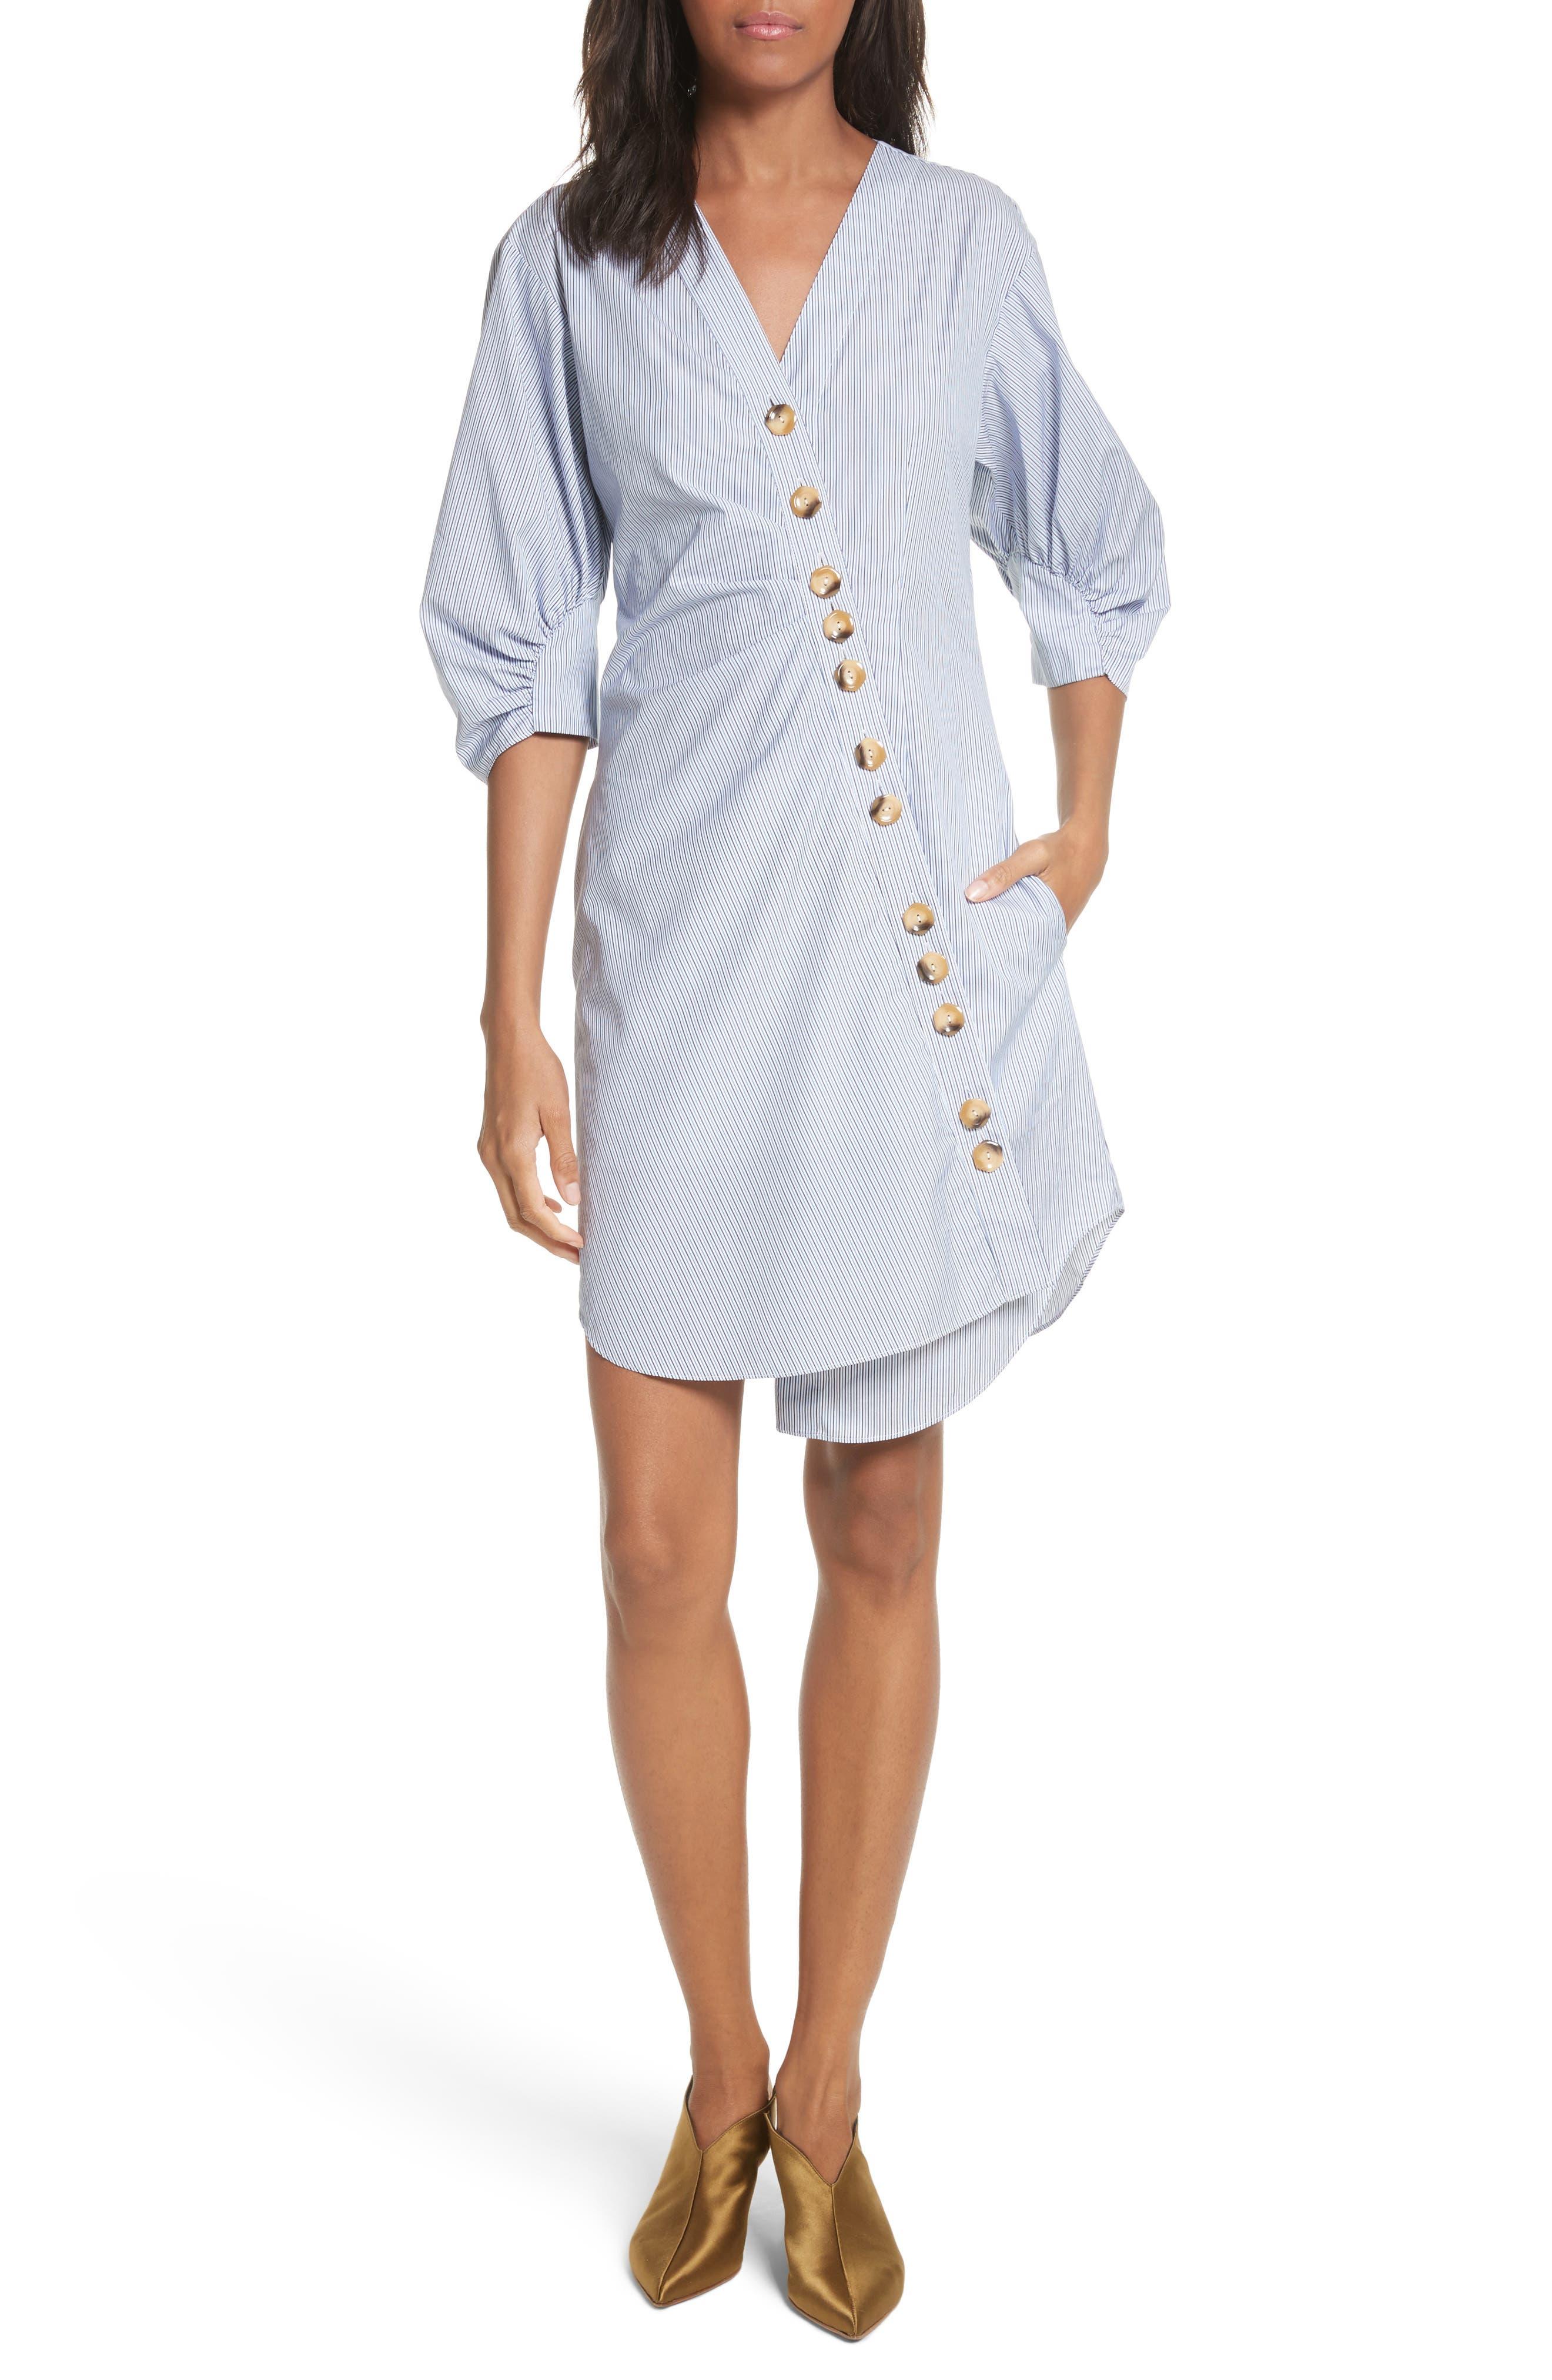 Alternate Image 1 Selected - Tibi Asymmetrical Cotton Shirtdress